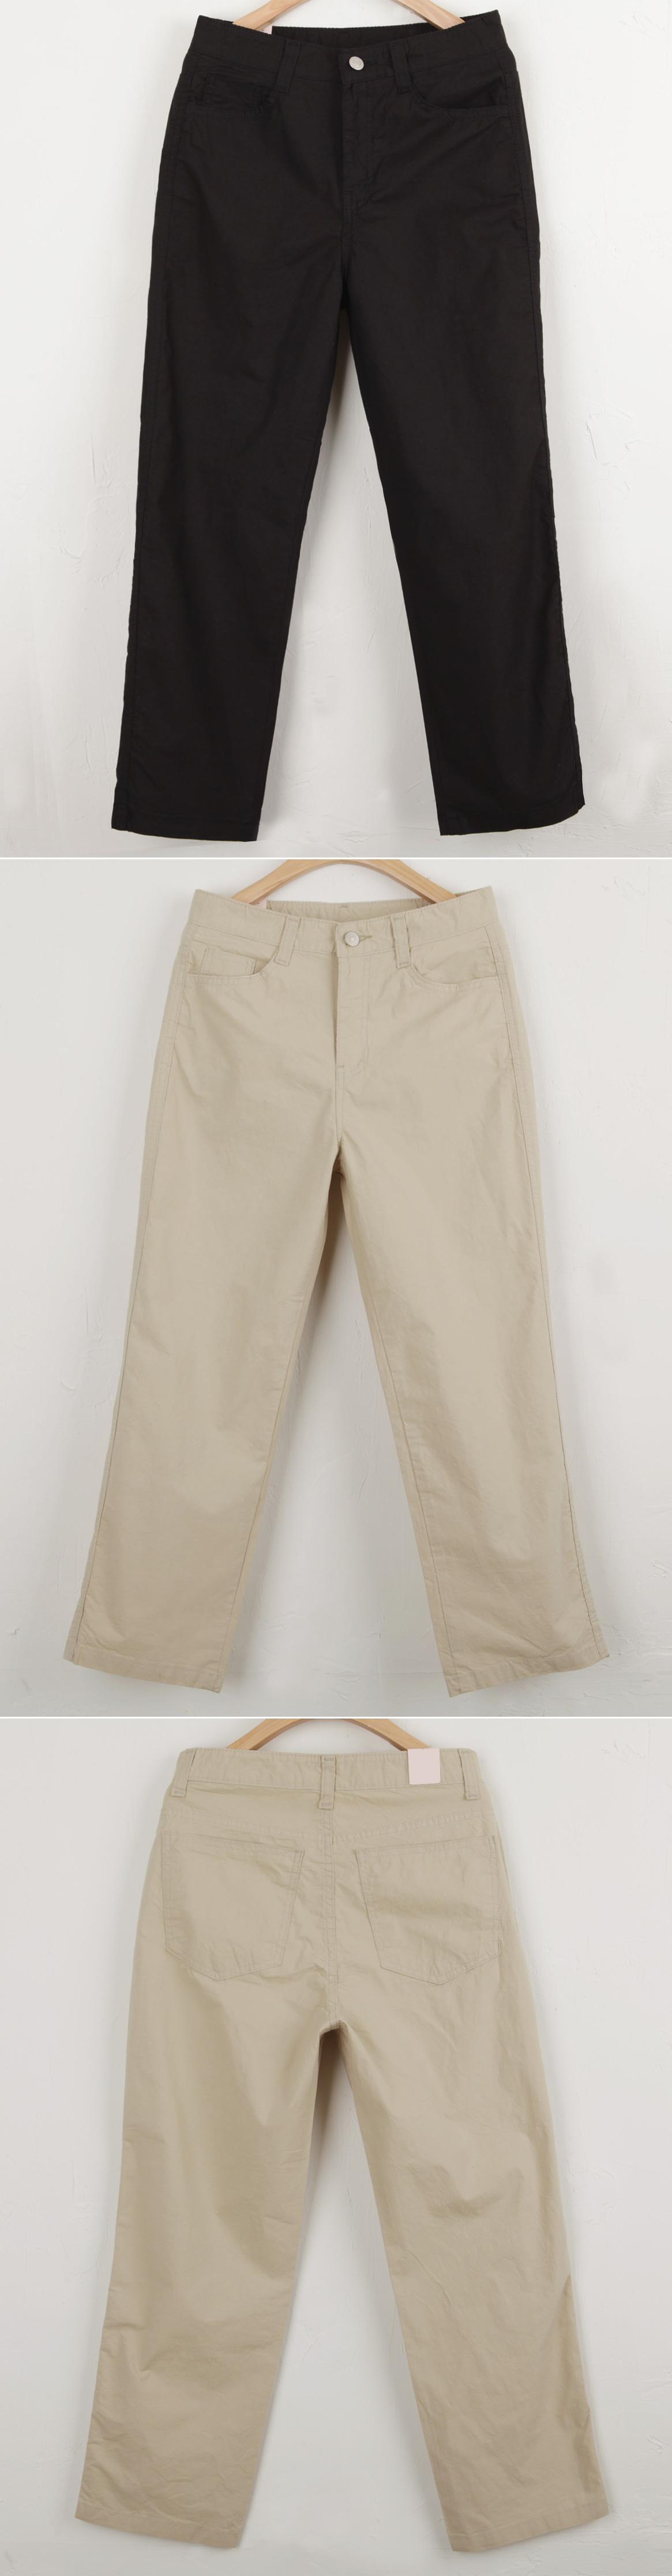 10% off sale beige pants -2147